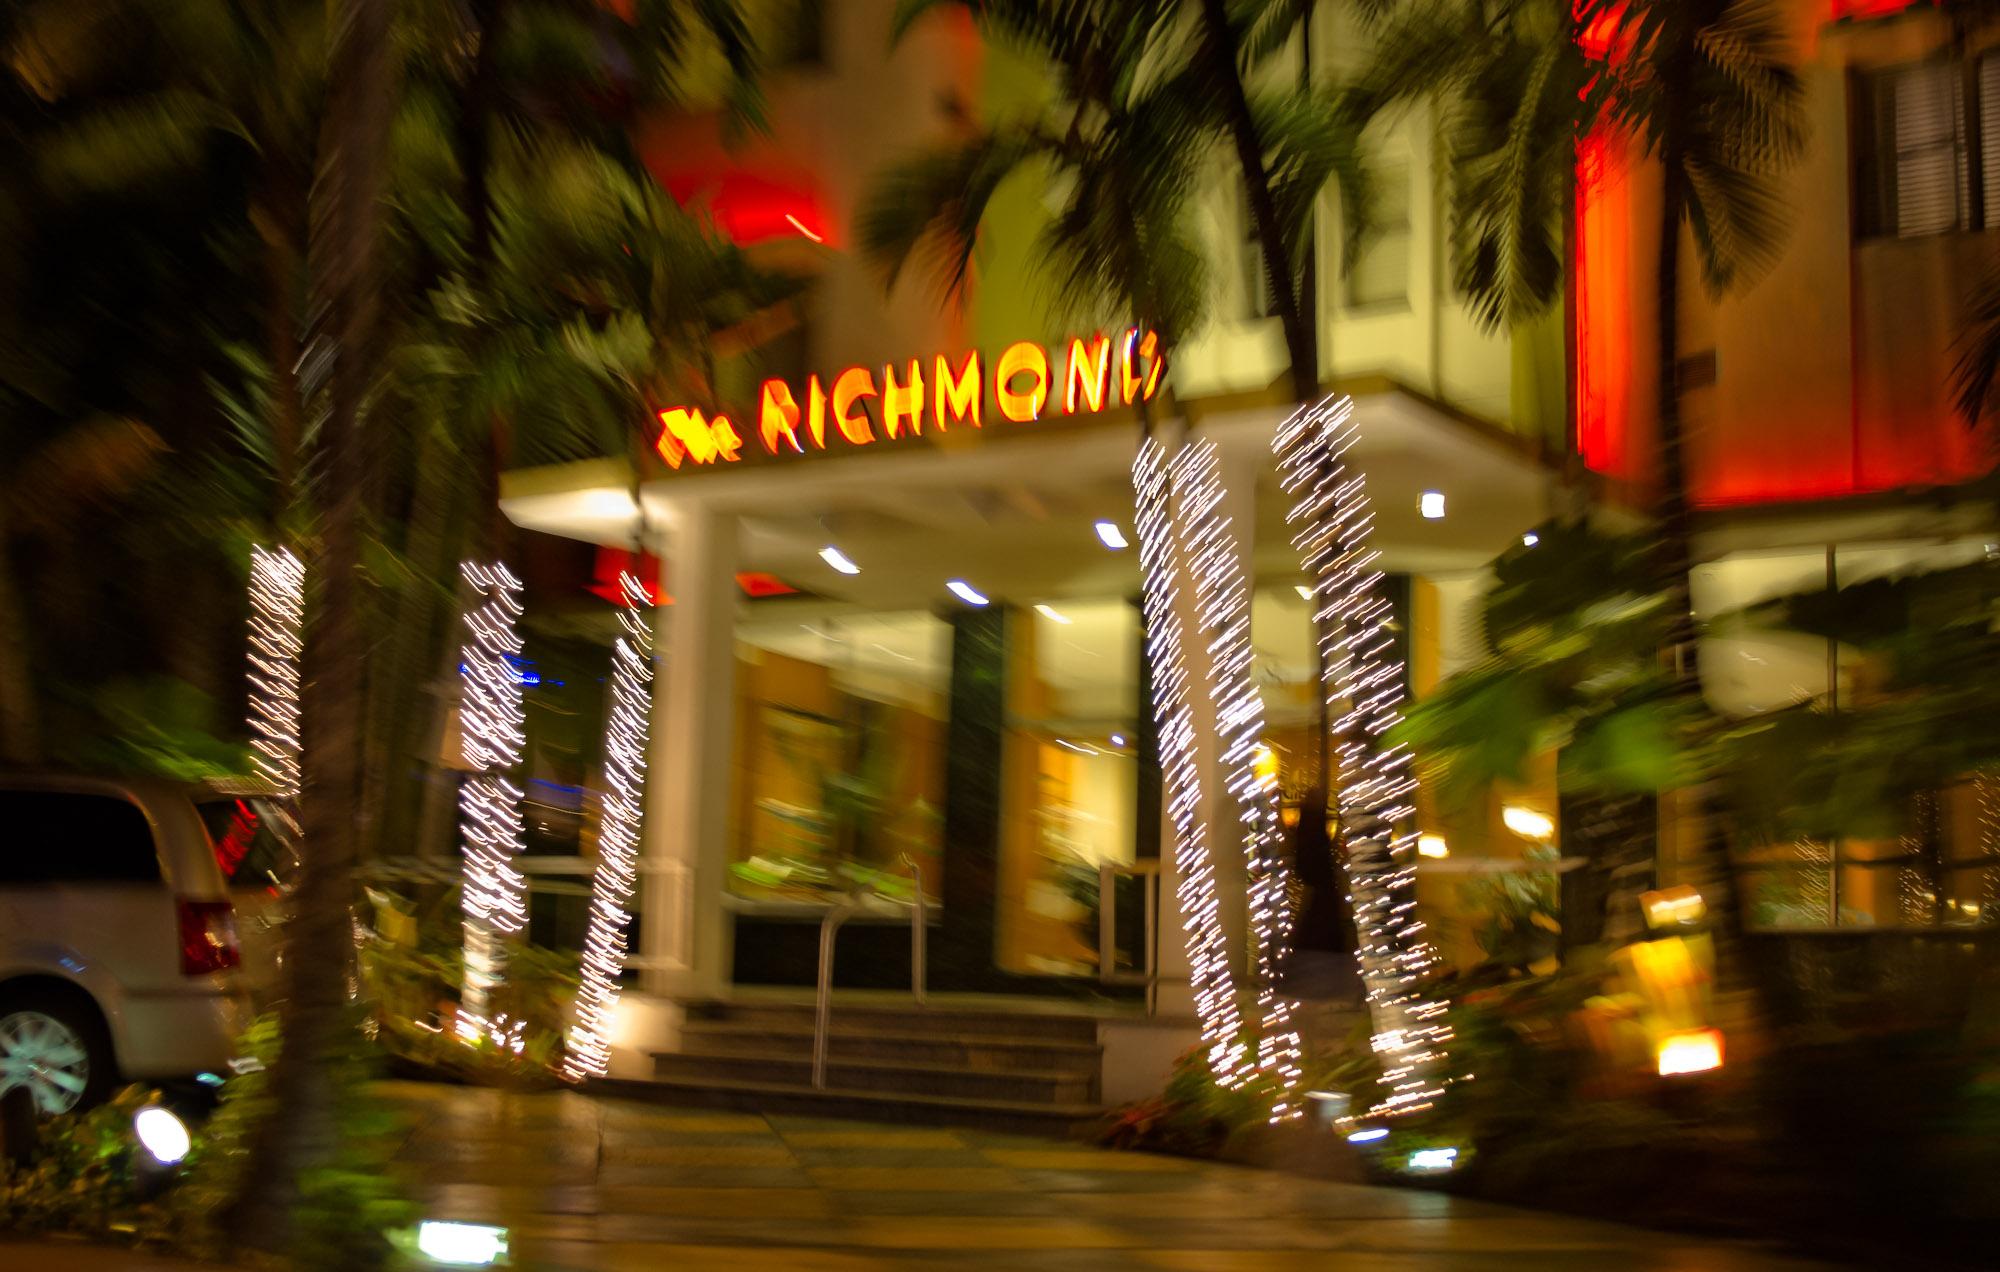 light night restaurant downtown evening christmas christmas decoration colour palmtree hotel miami christmas lights